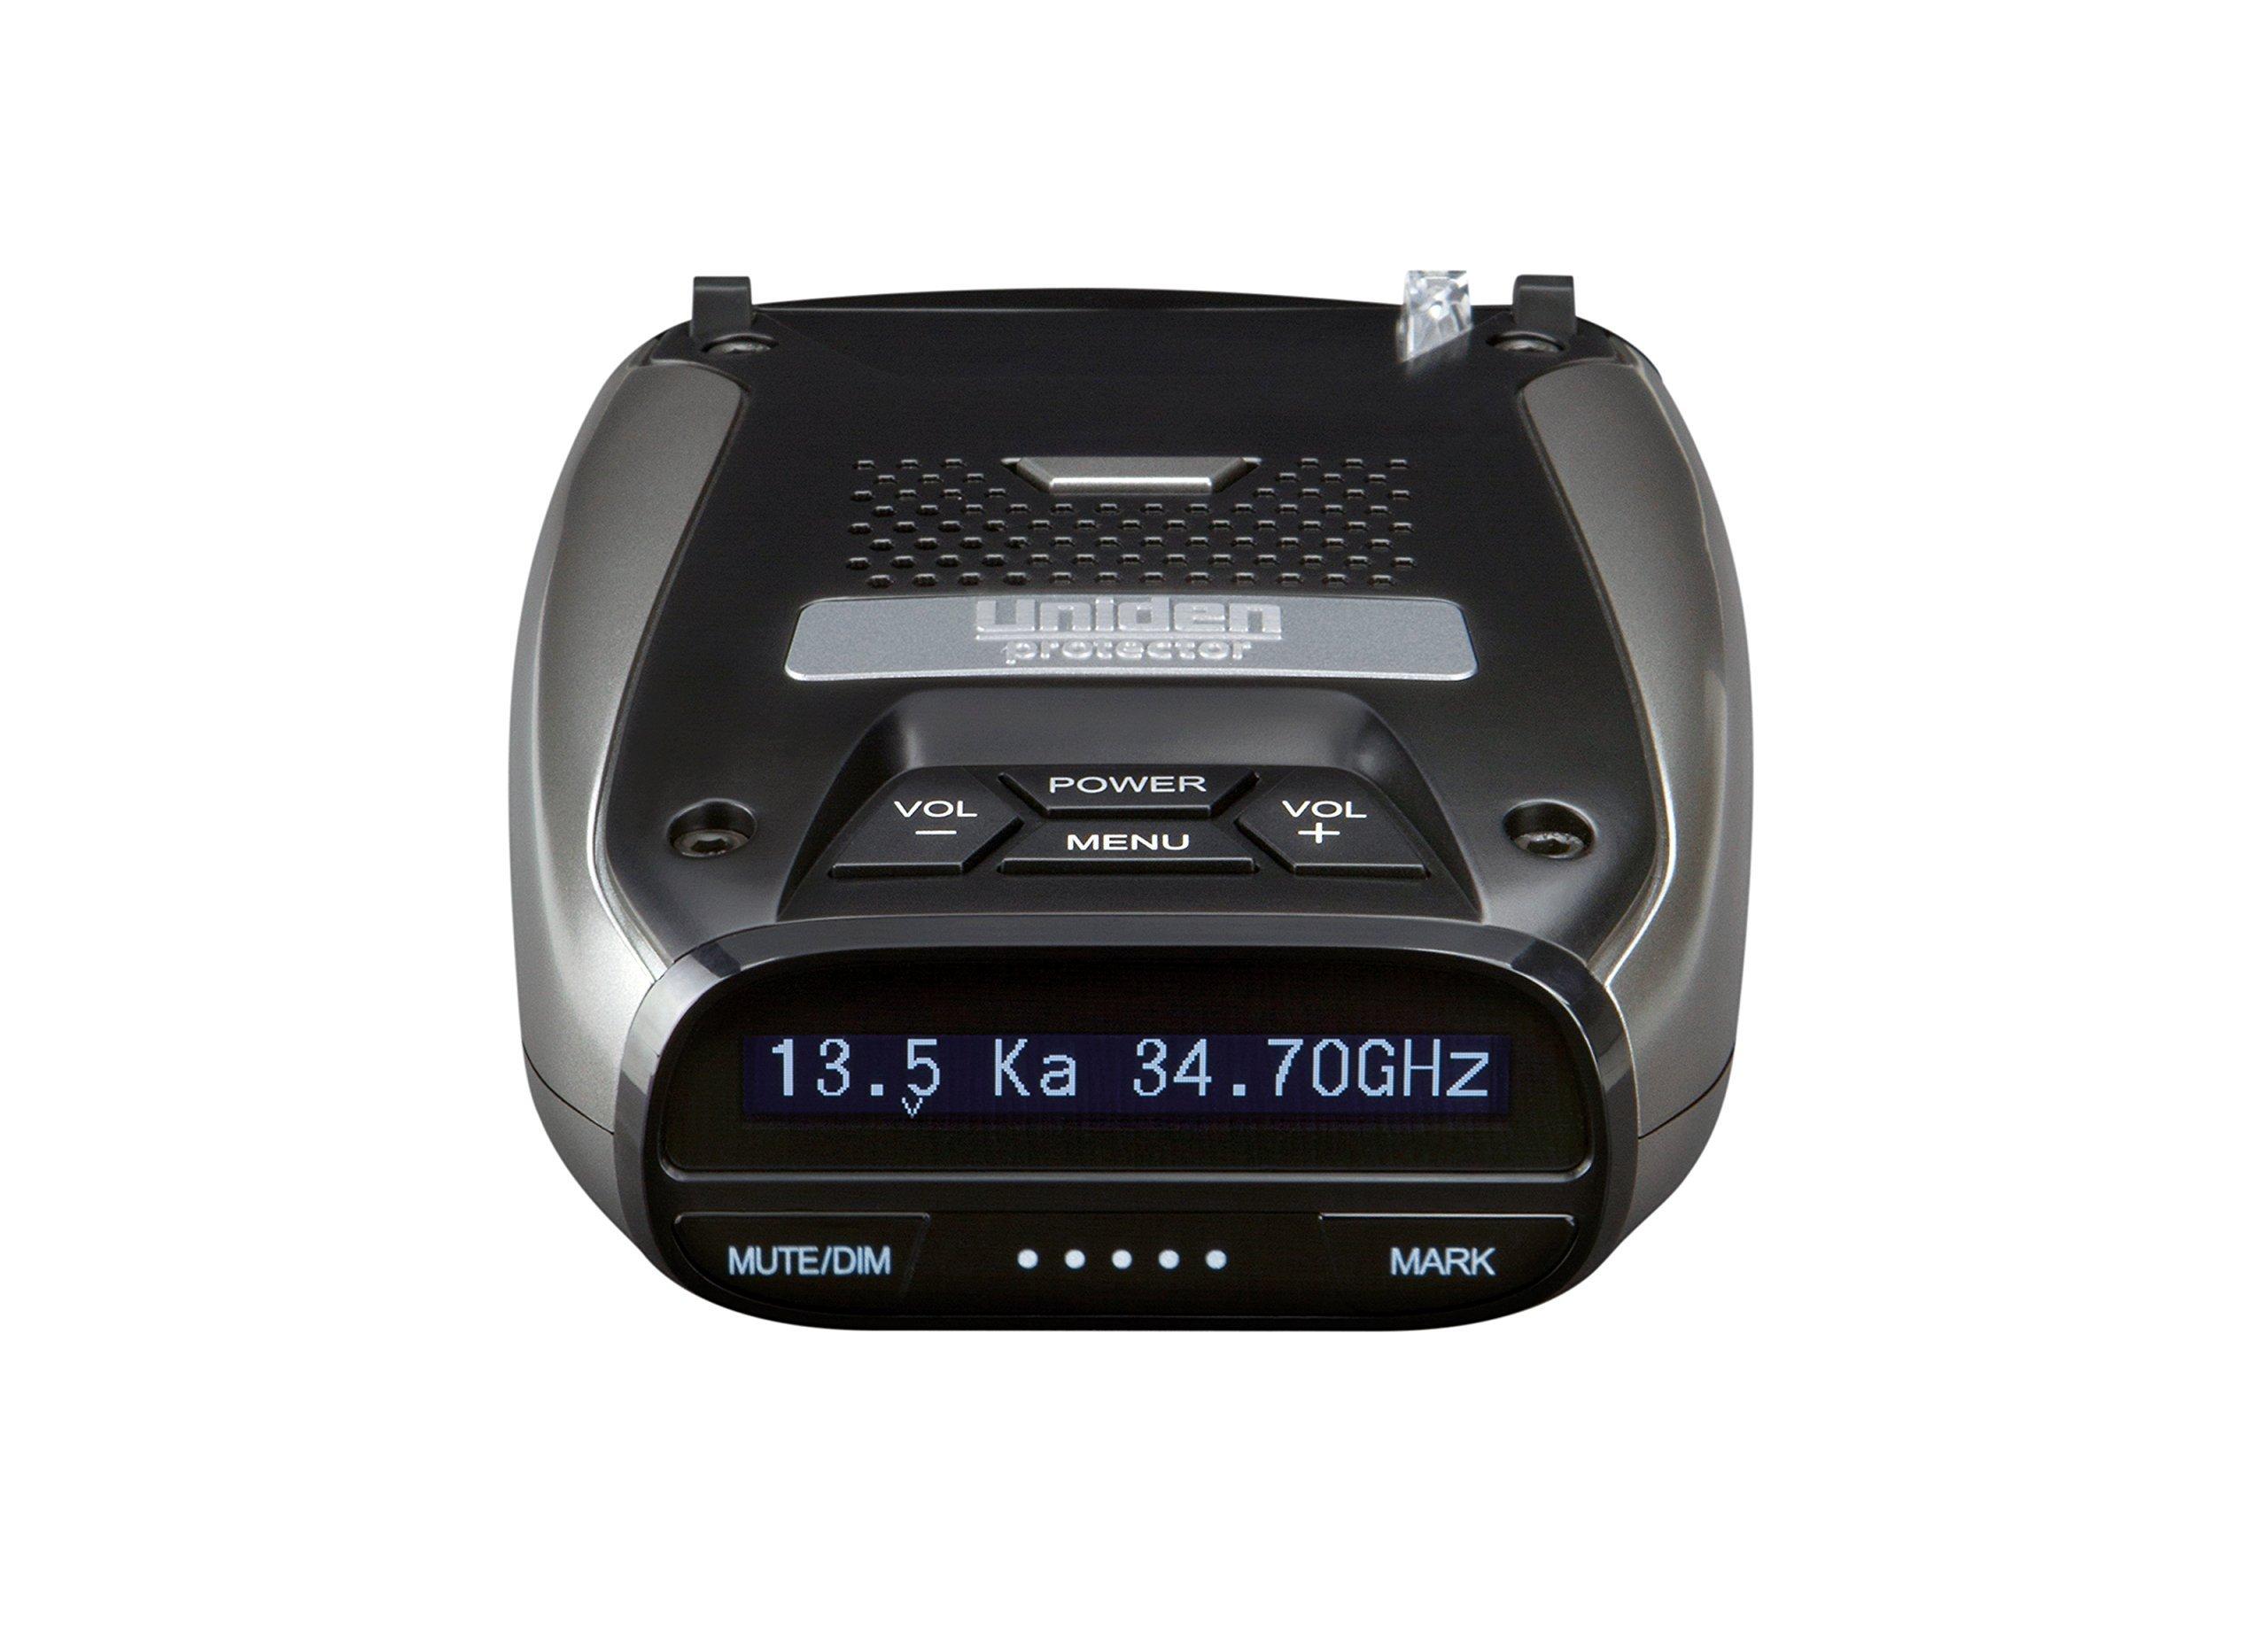 Uniden LRD950 Laser Radar Detector with GPS and Red Light Traffic Camera Alert (Certified Refurbished)